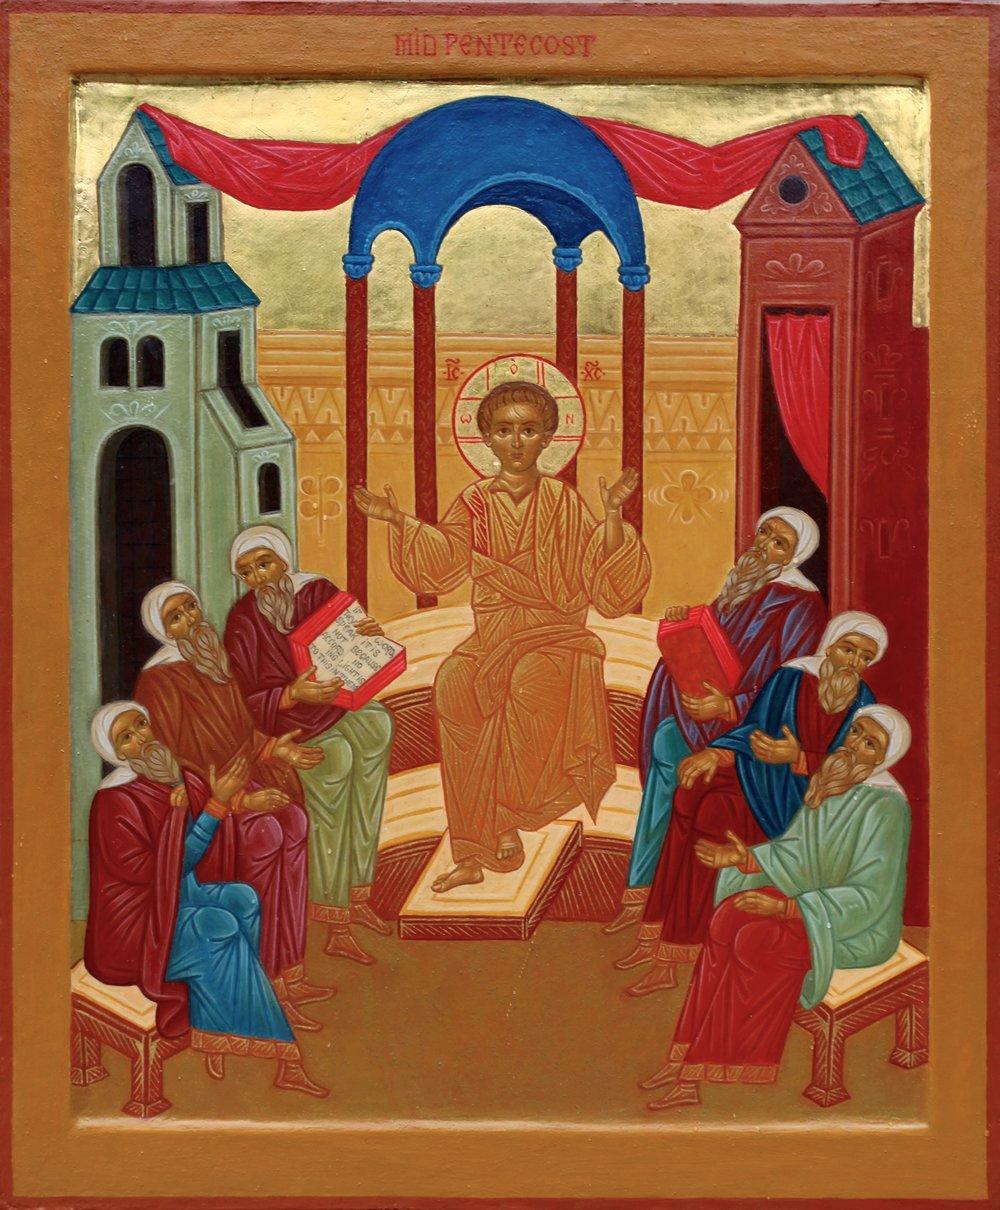 Mid Feast of Pentecost